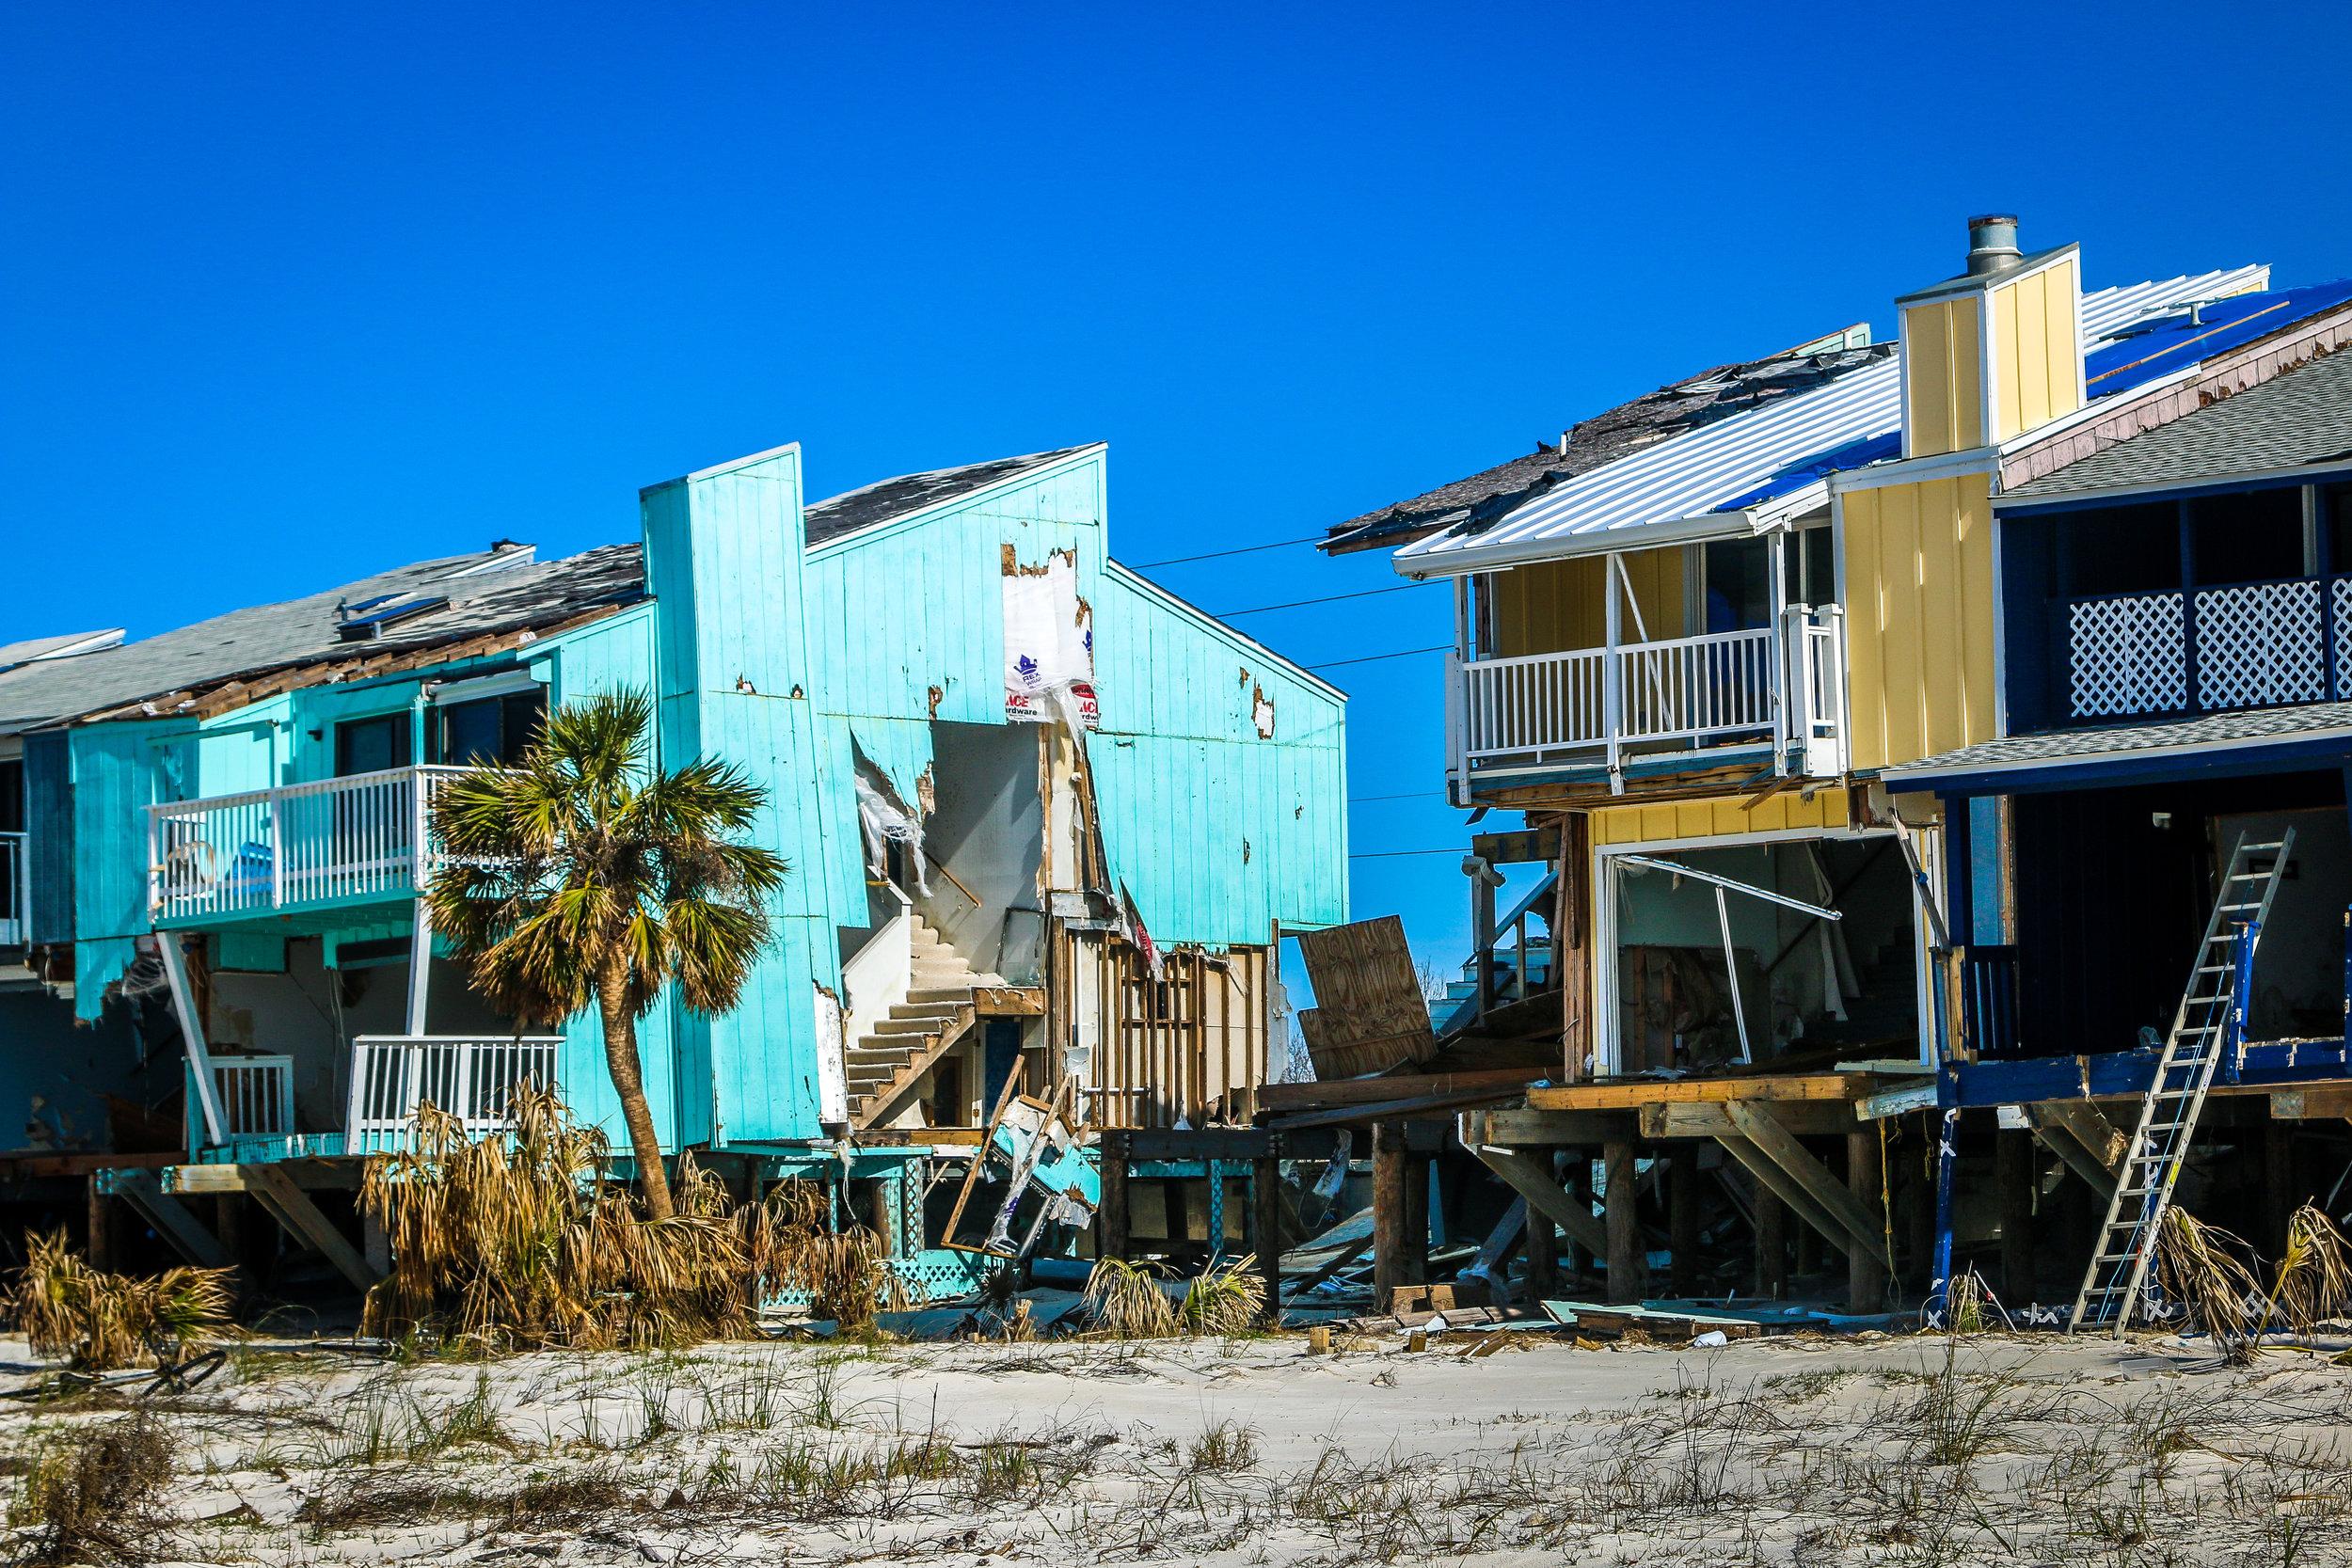 Hurricane Damage Plagues the Forgotten Coast